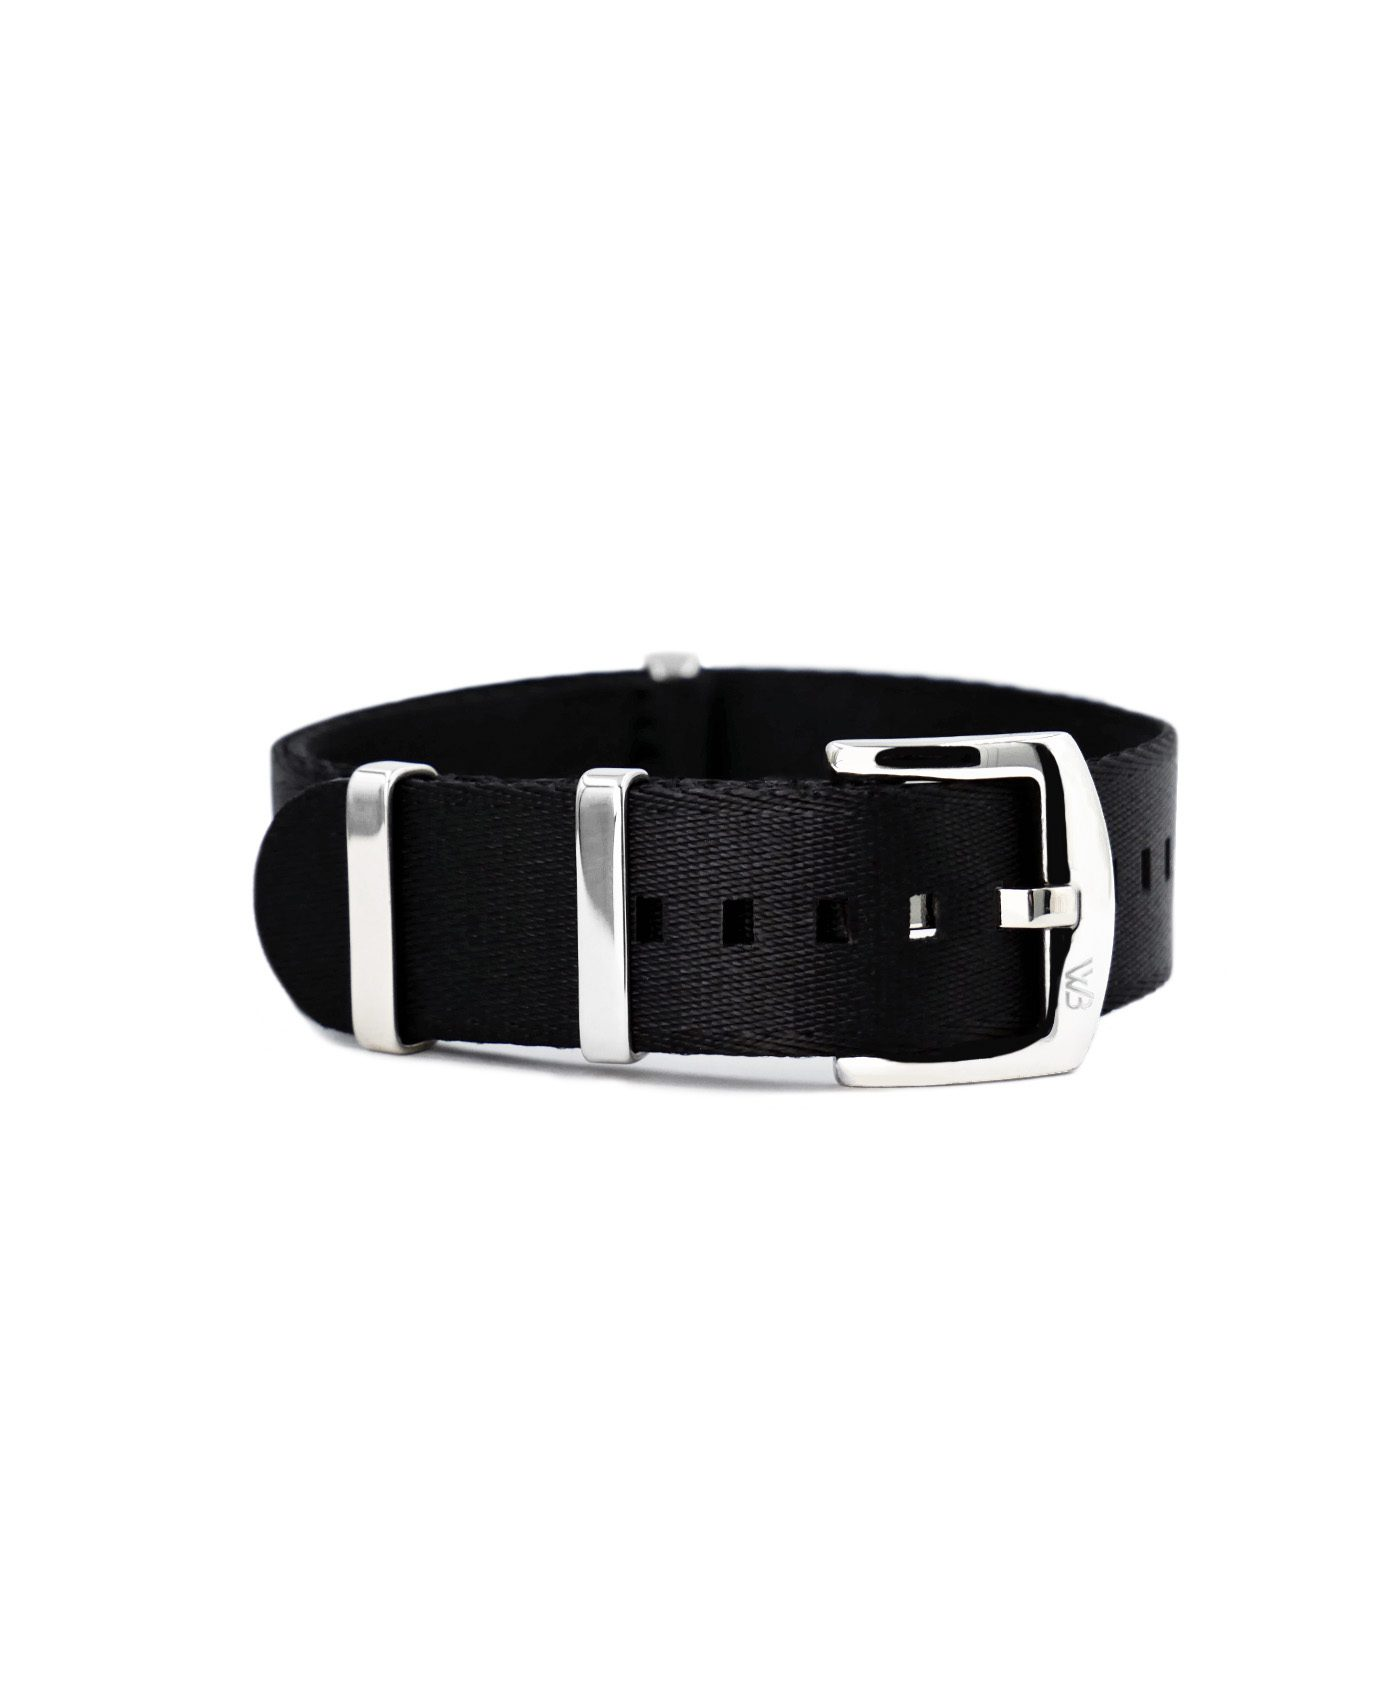 Premium 1.2 mm seat belt polished NATO Strap black front by WatchBandit